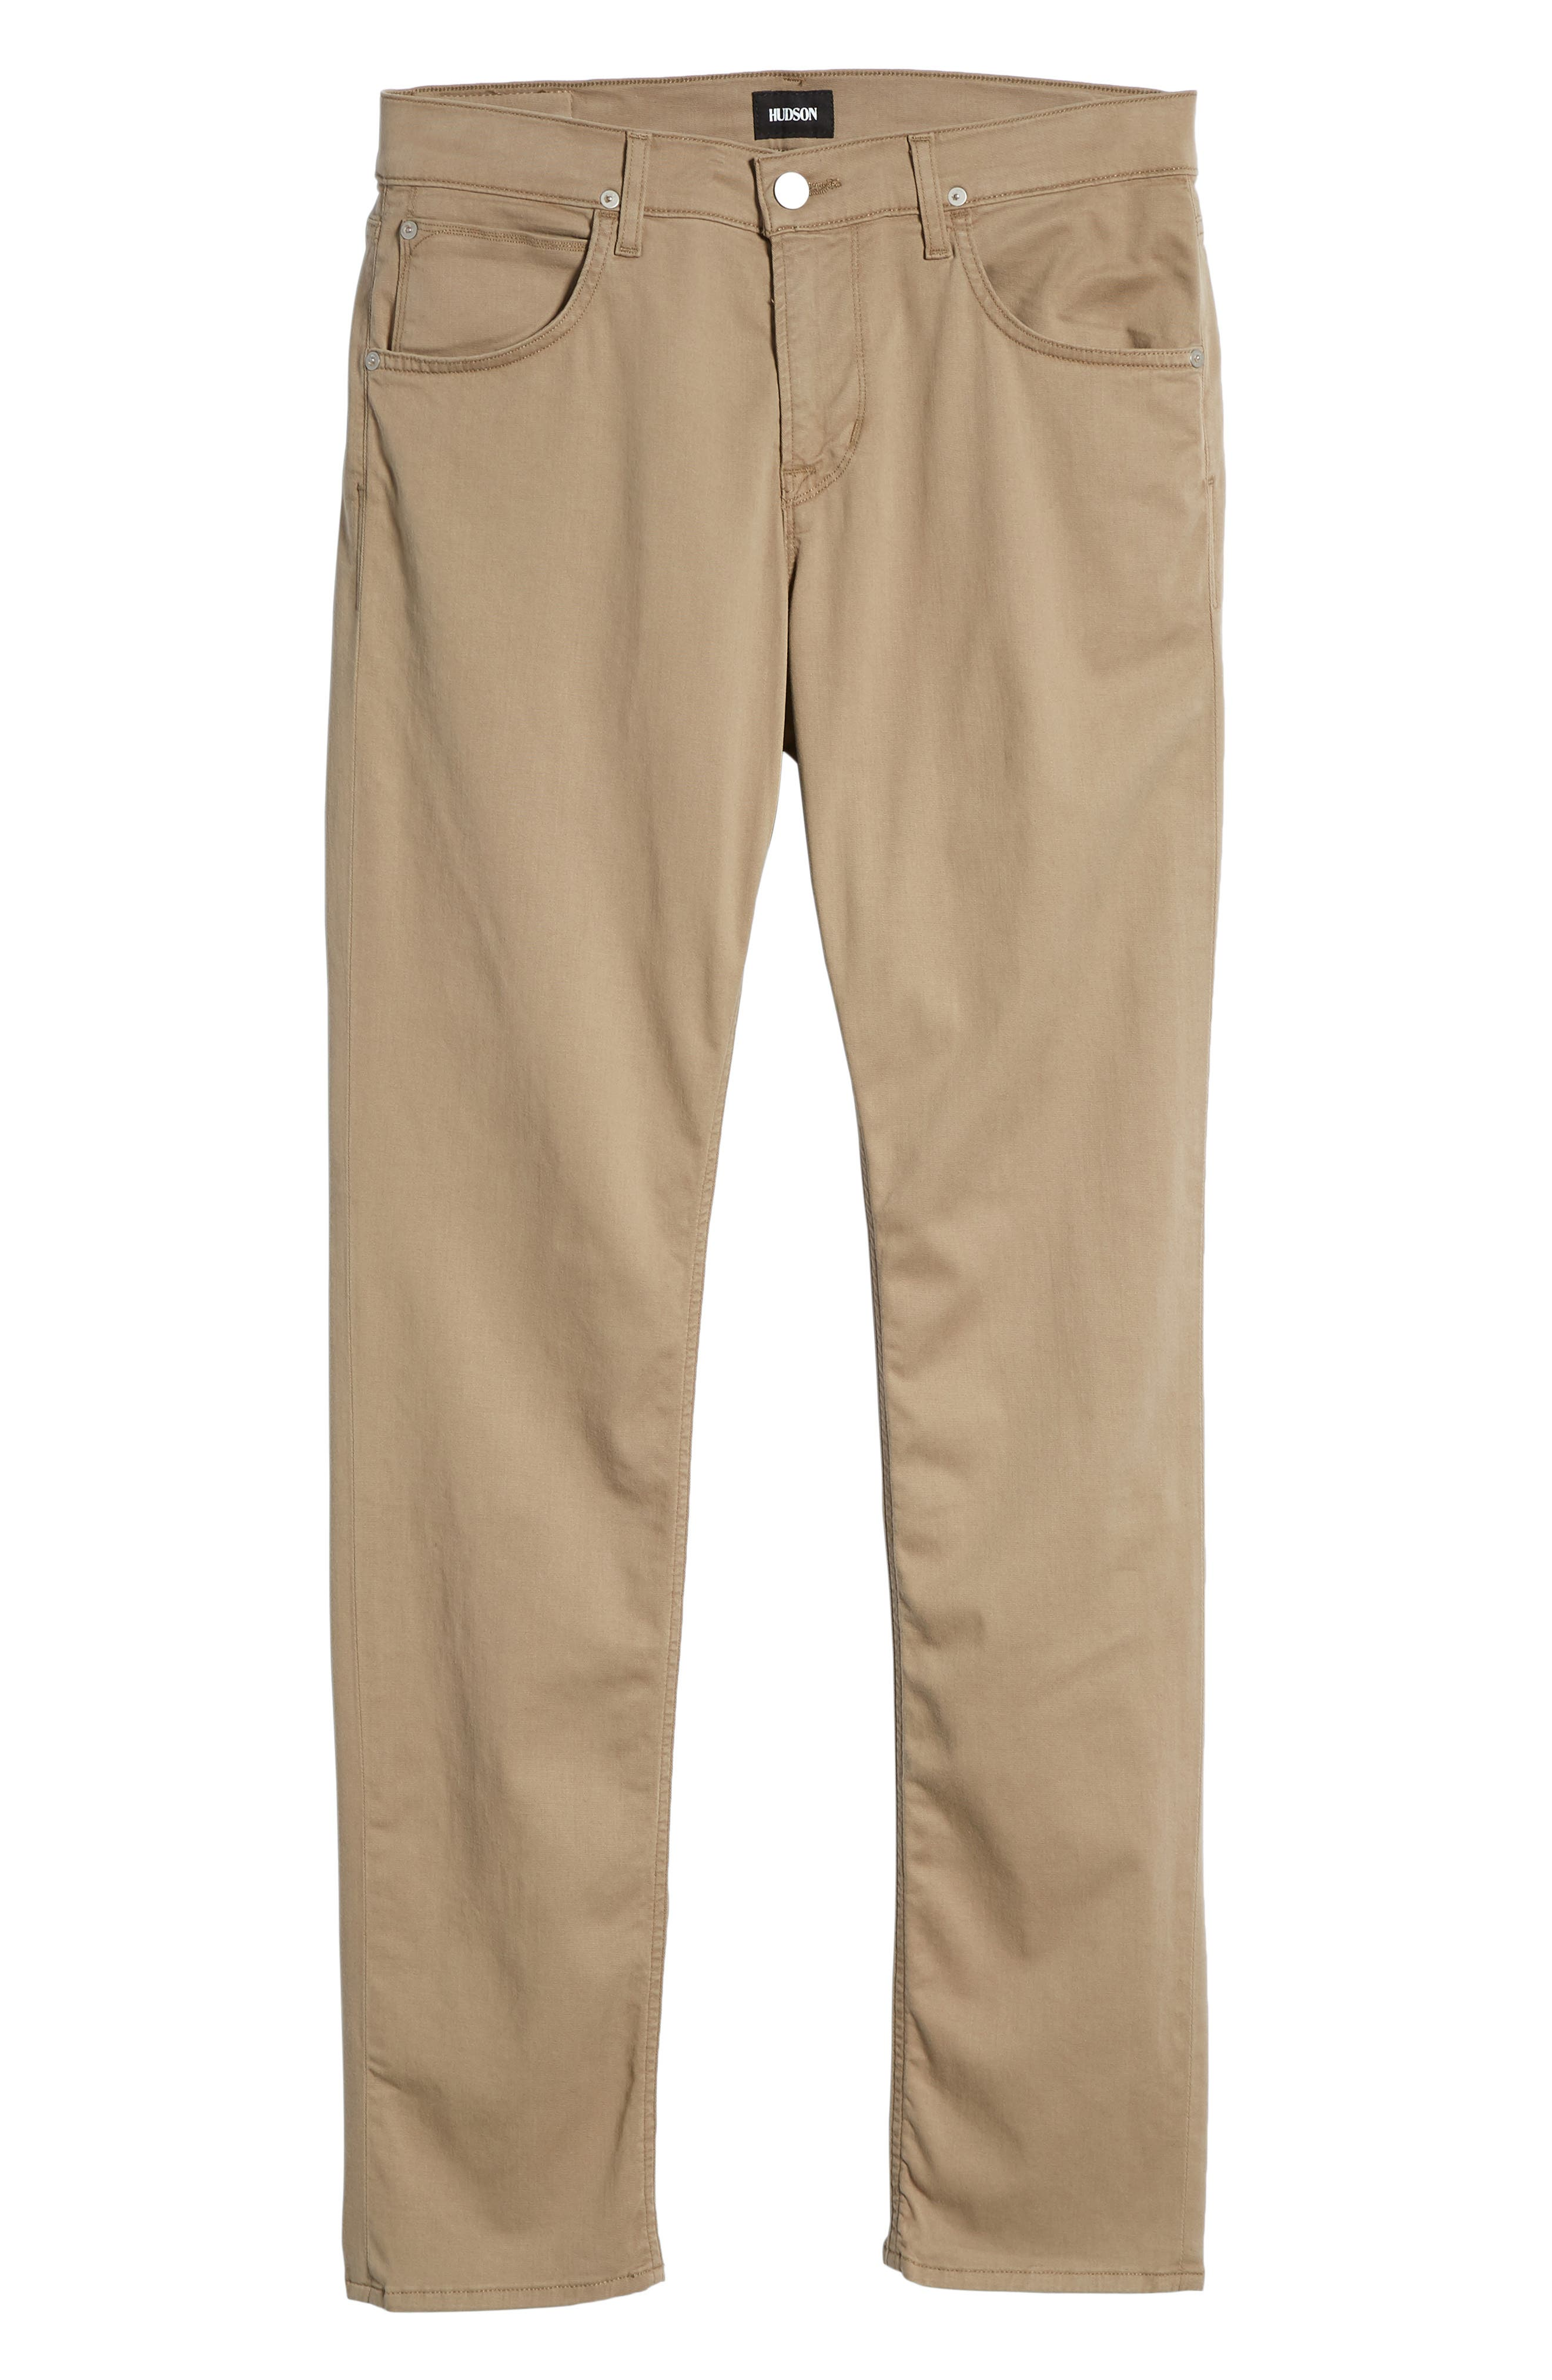 Blake Slim Fit Jeans,                             Alternate thumbnail 6, color,                             Sandman